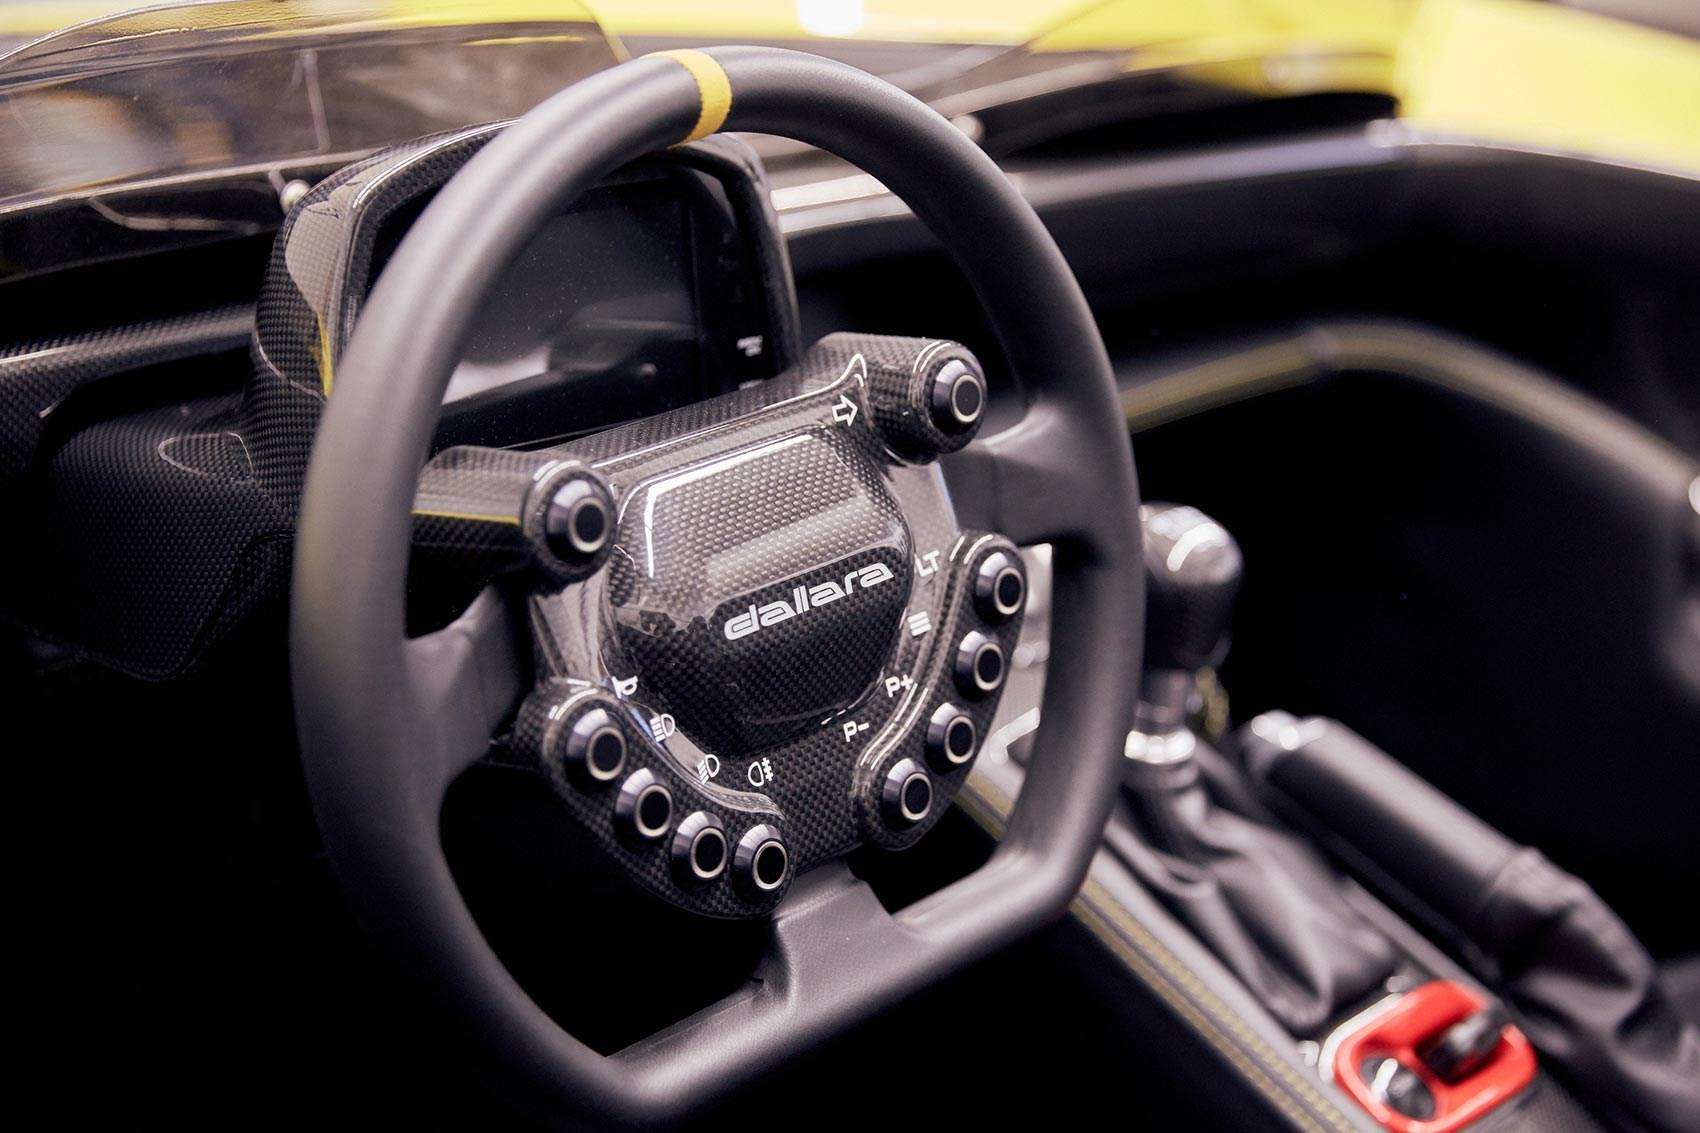 Dallara Stradale interior: a very focused cockpit